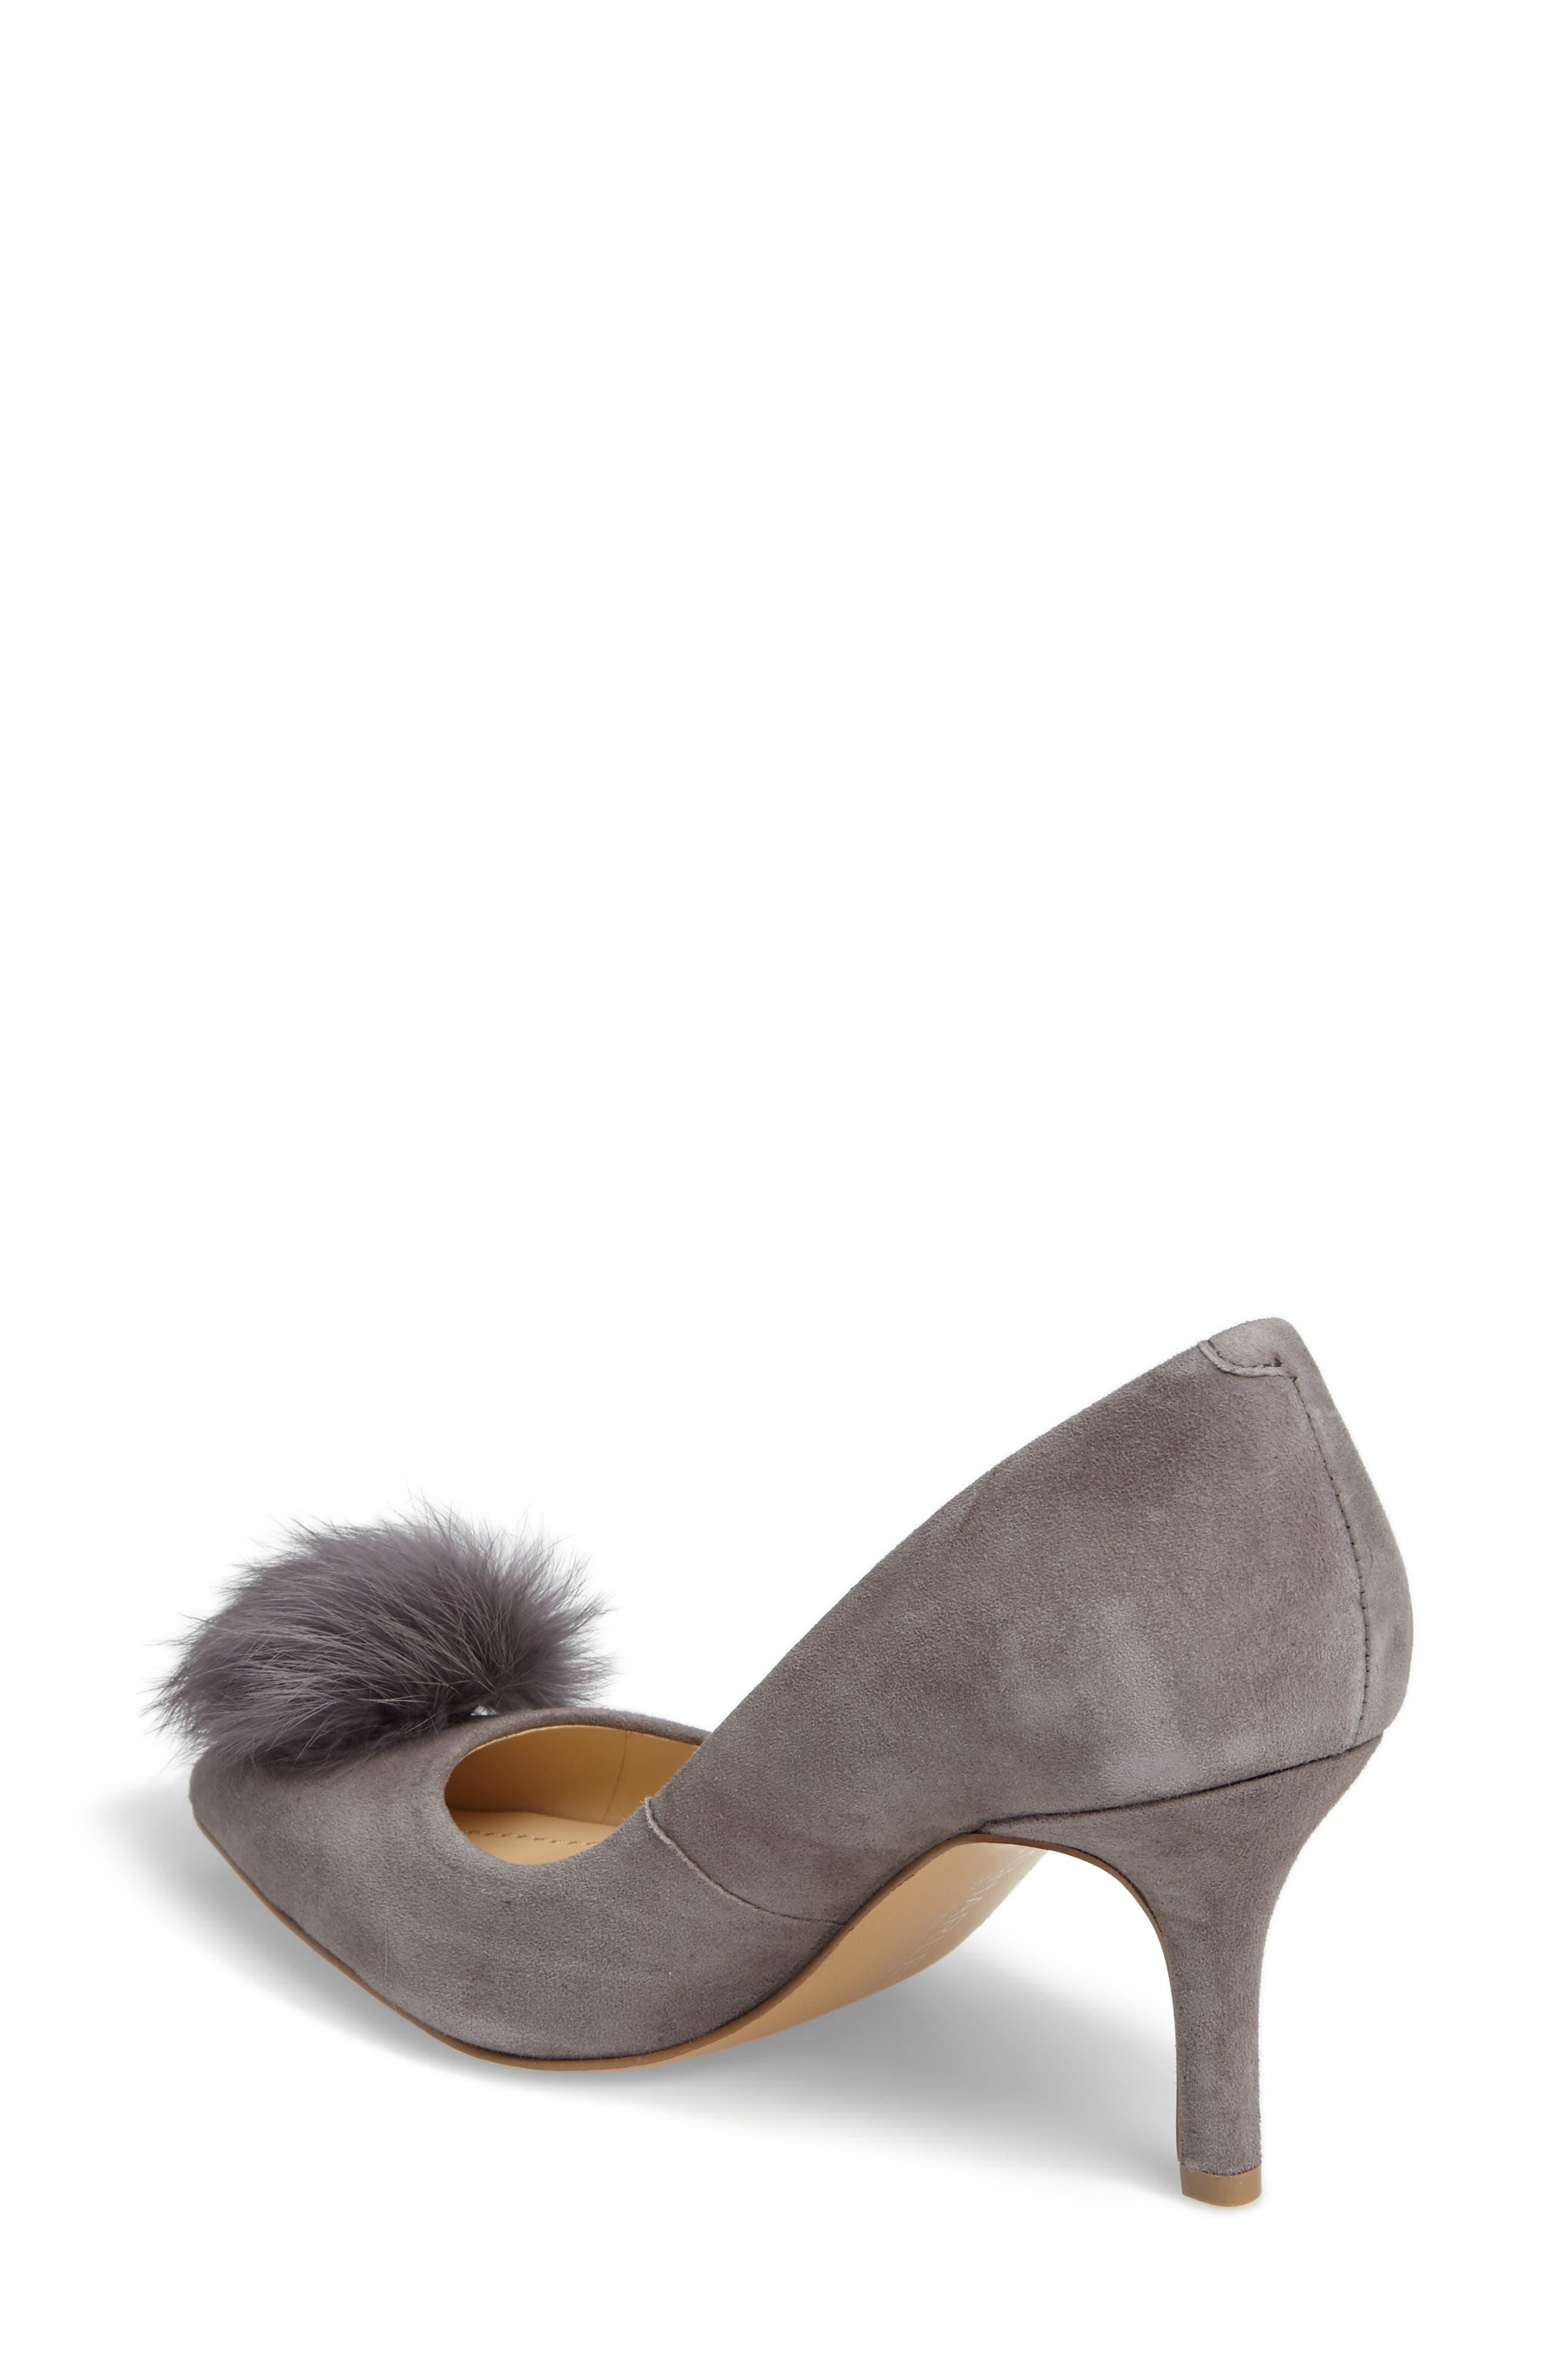 Sadie Genuine Rabbit Fur Pom Pump,                             Alternate thumbnail 2, color,                             Slate Suede